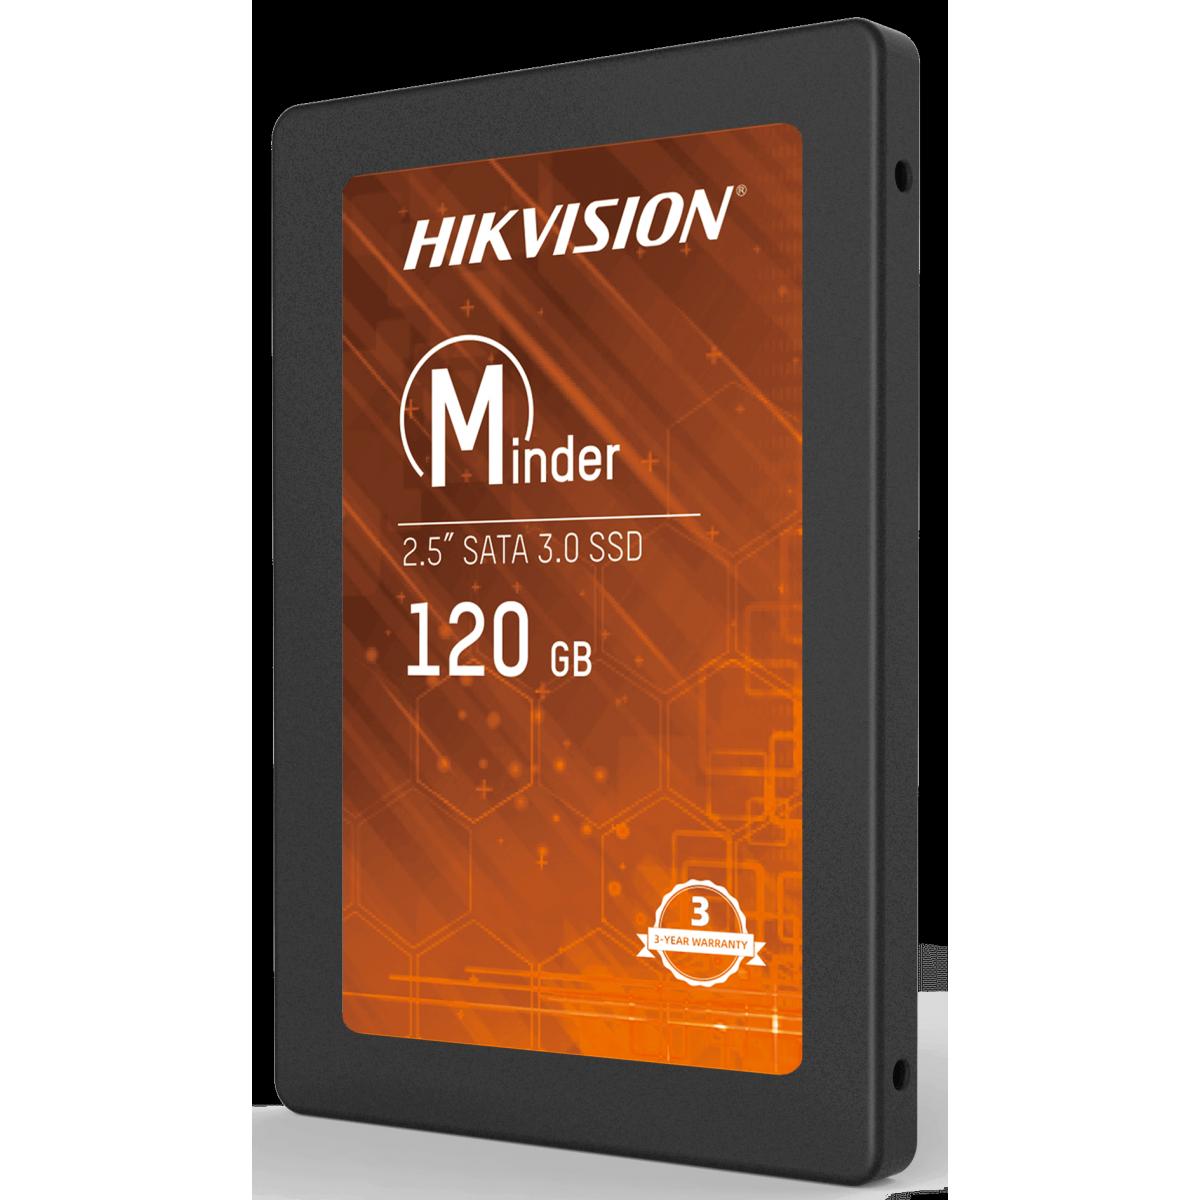 SSD Hikvision Minder, 120GB, Sata III, Leitura 460MBs e Gravação 360MBs, HS-SSD-Minder(S)/120G